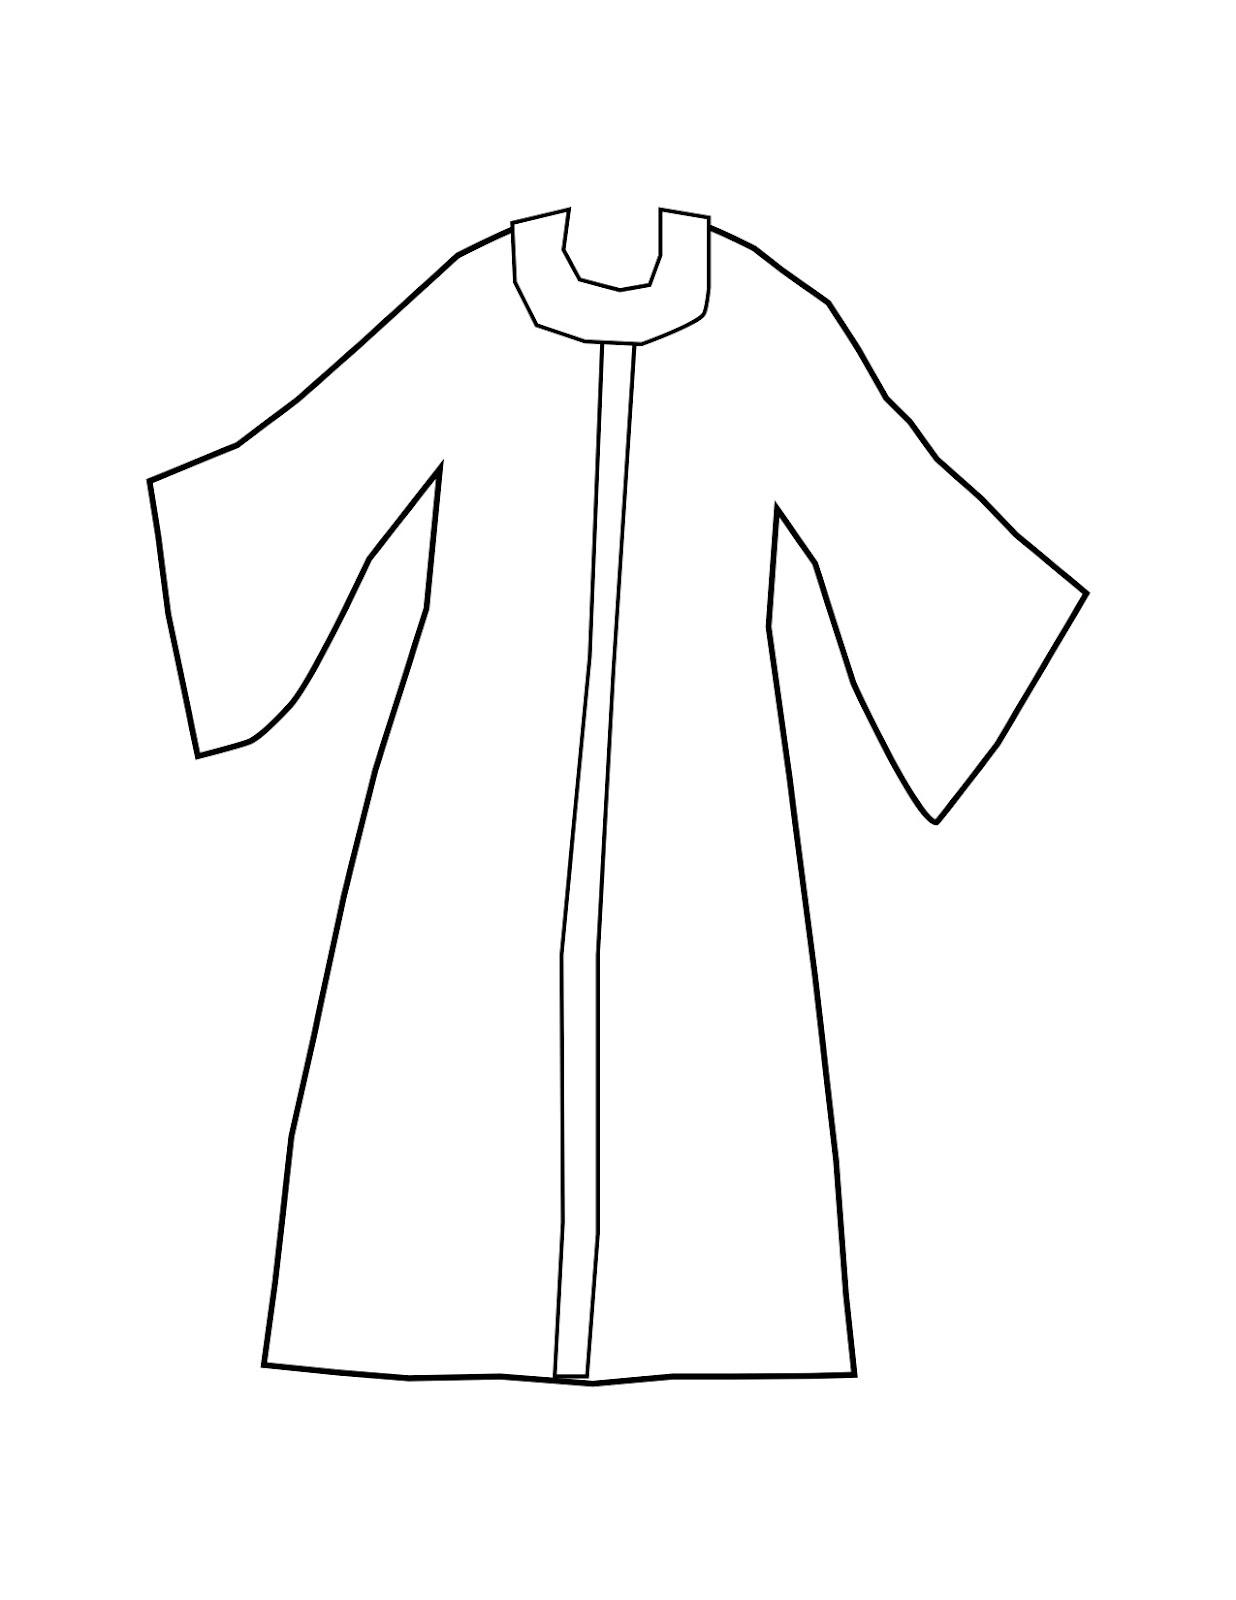 Robe coloring #12, Download drawings